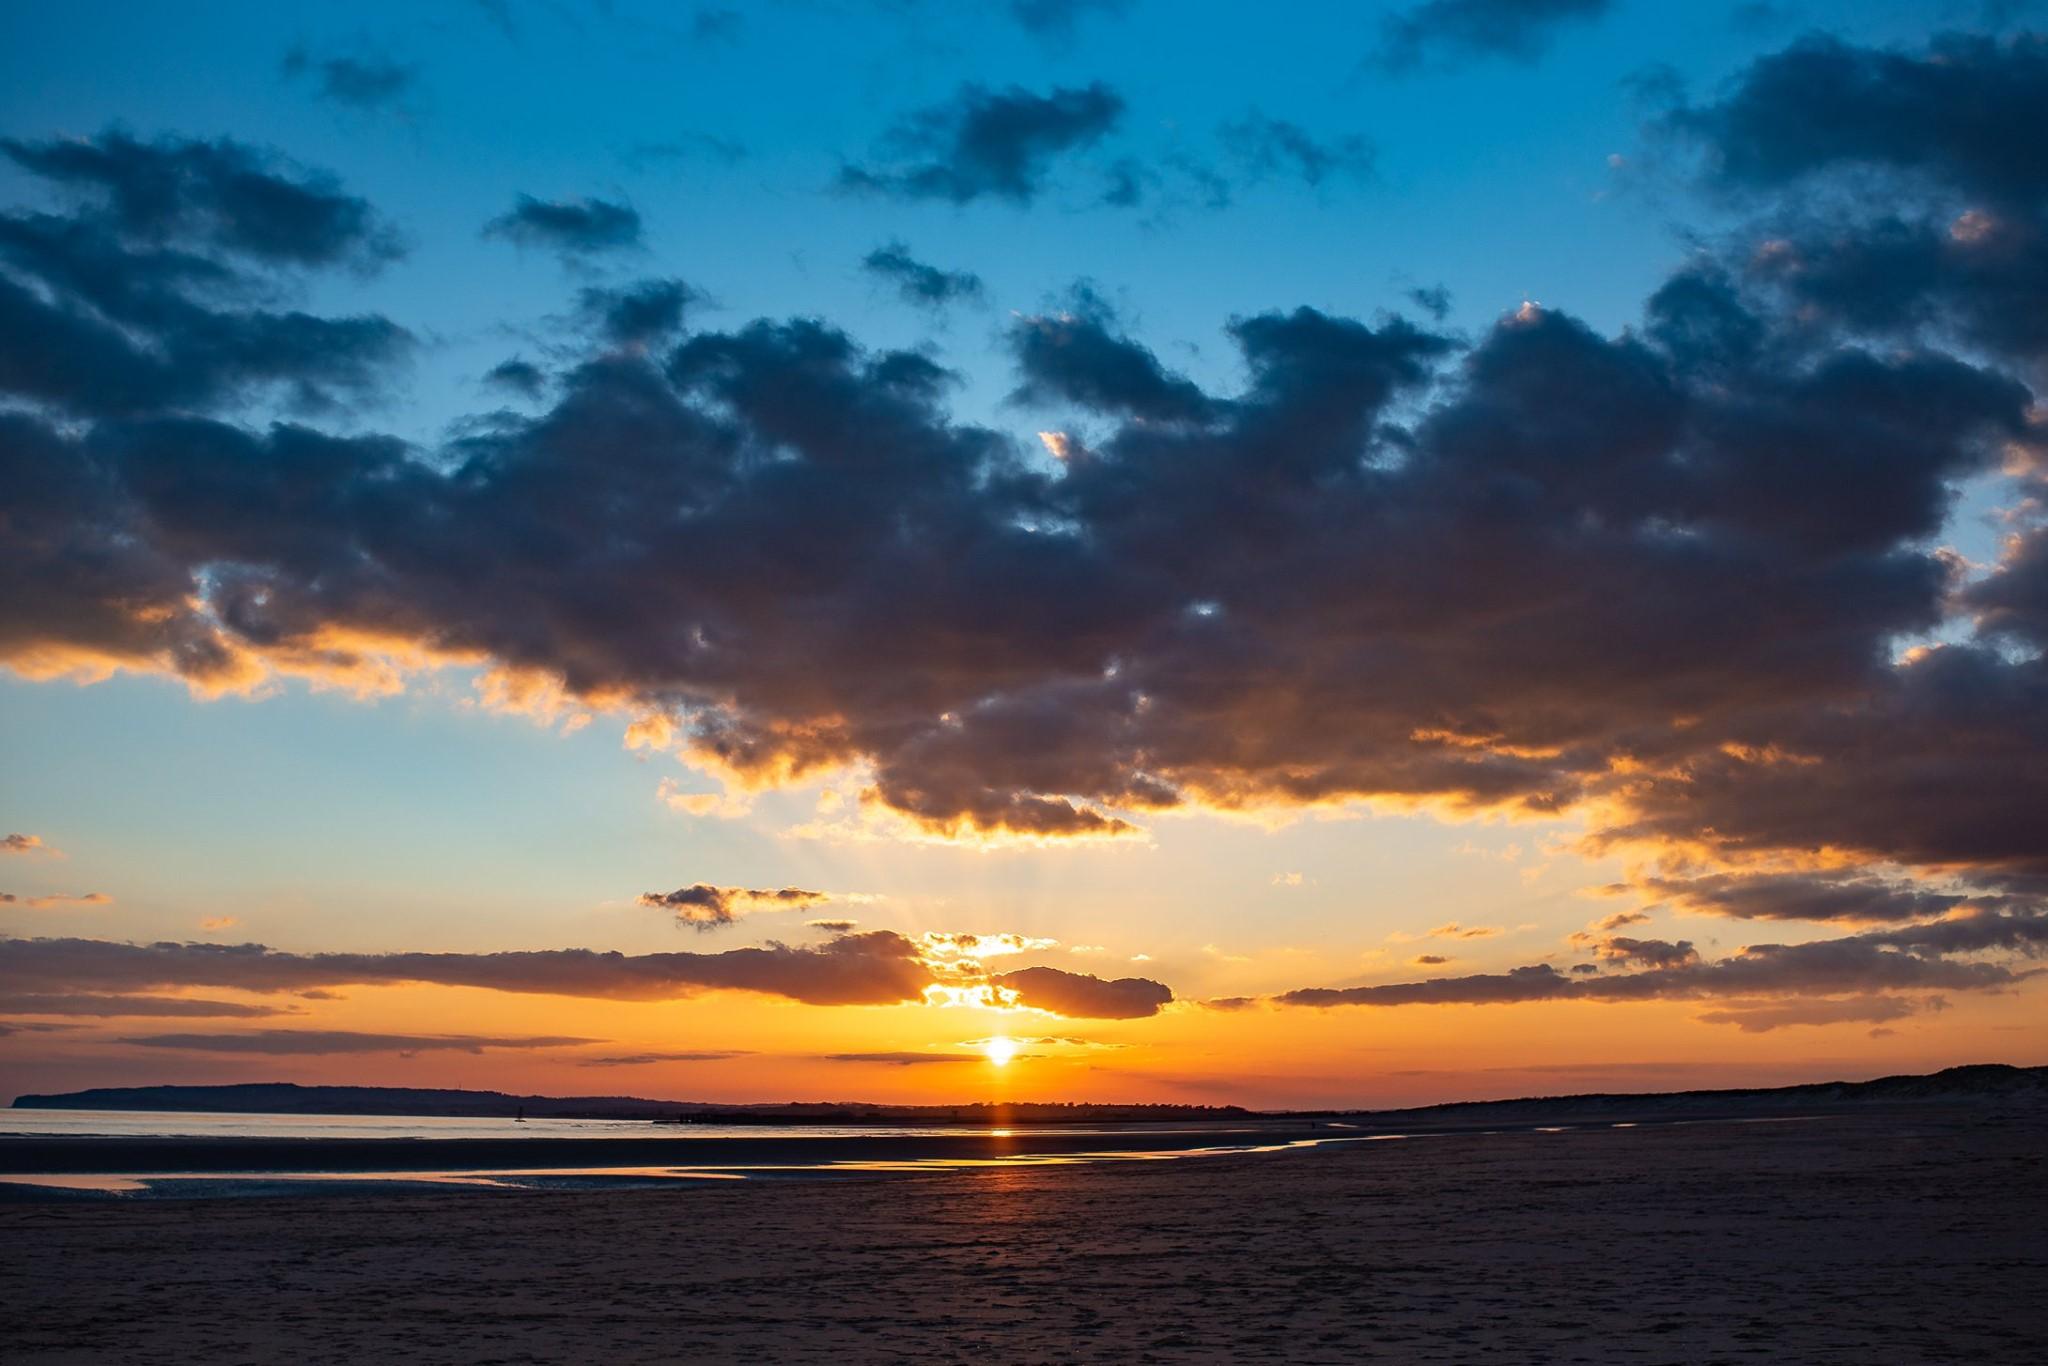 dougal photography, family photography, beach photography, camber sands photography, sunrise photography, sunset photography